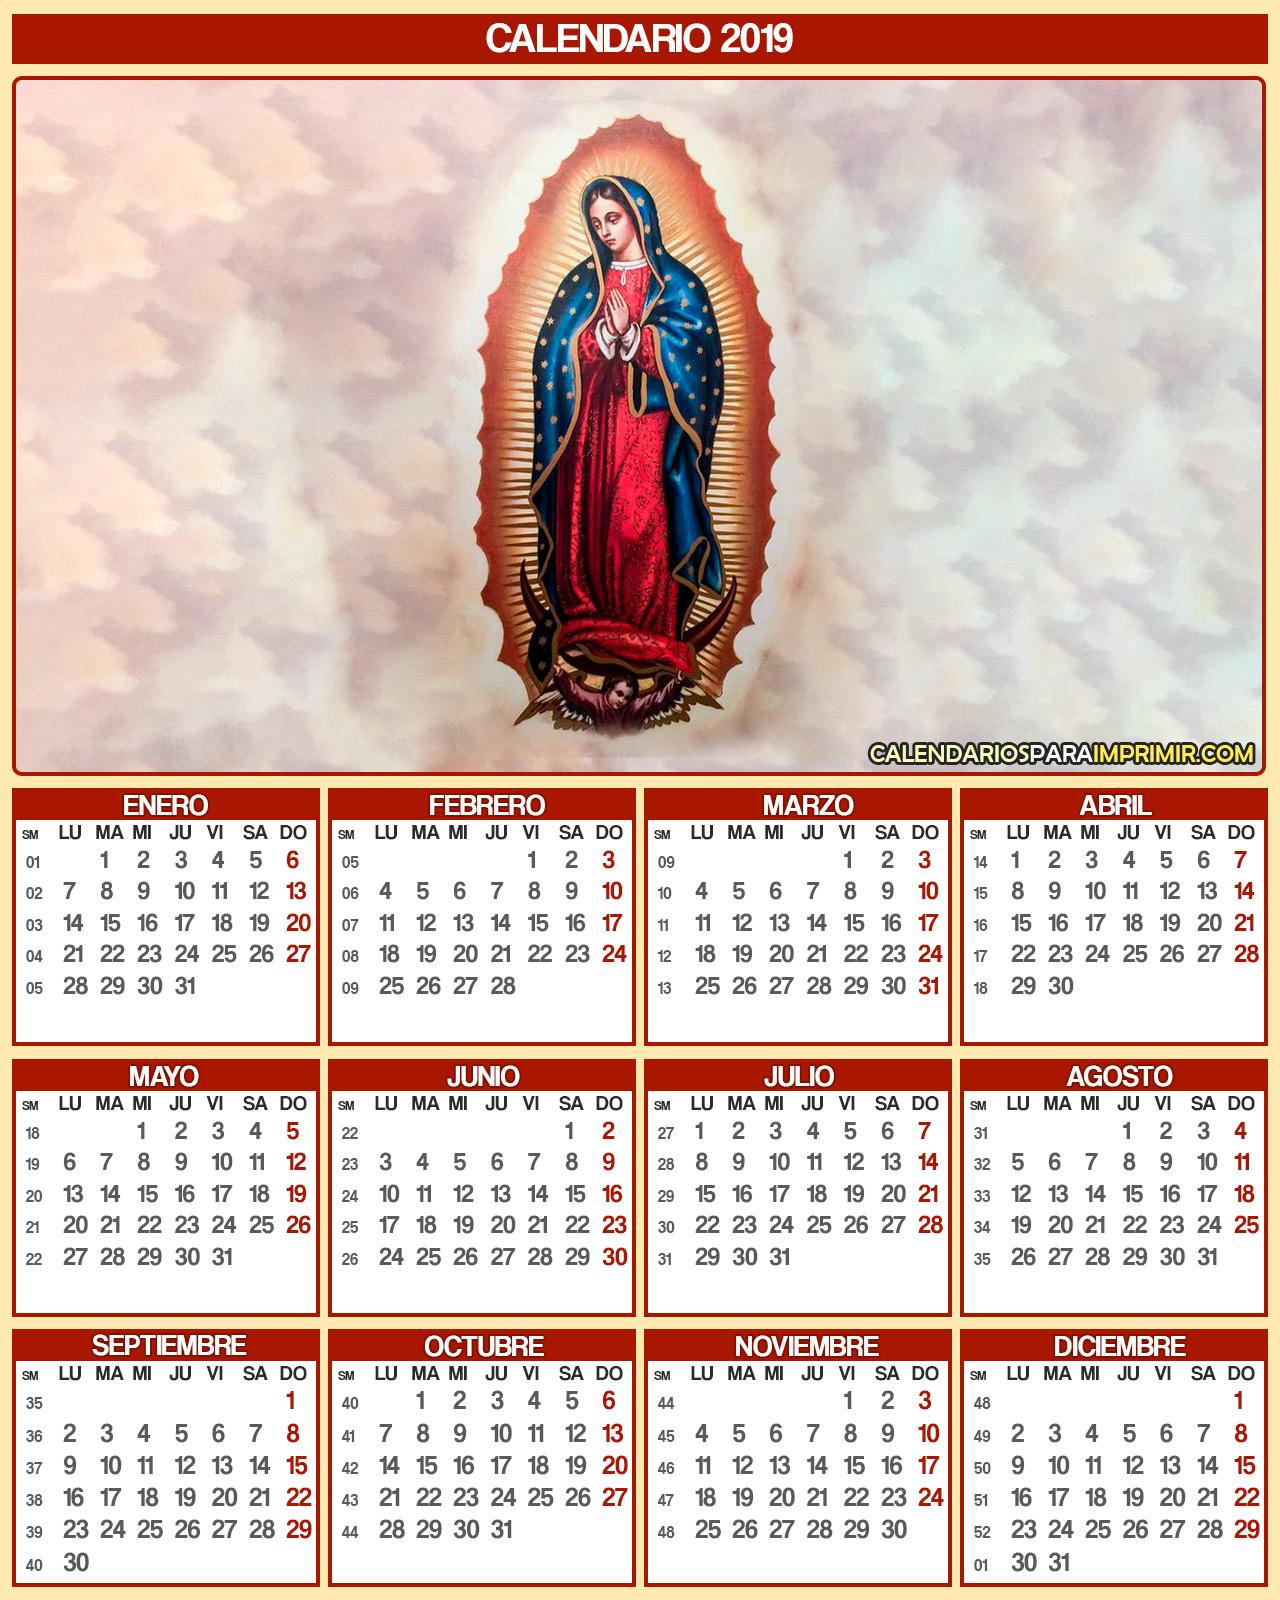 calendario 2019 virgen de guadalupe